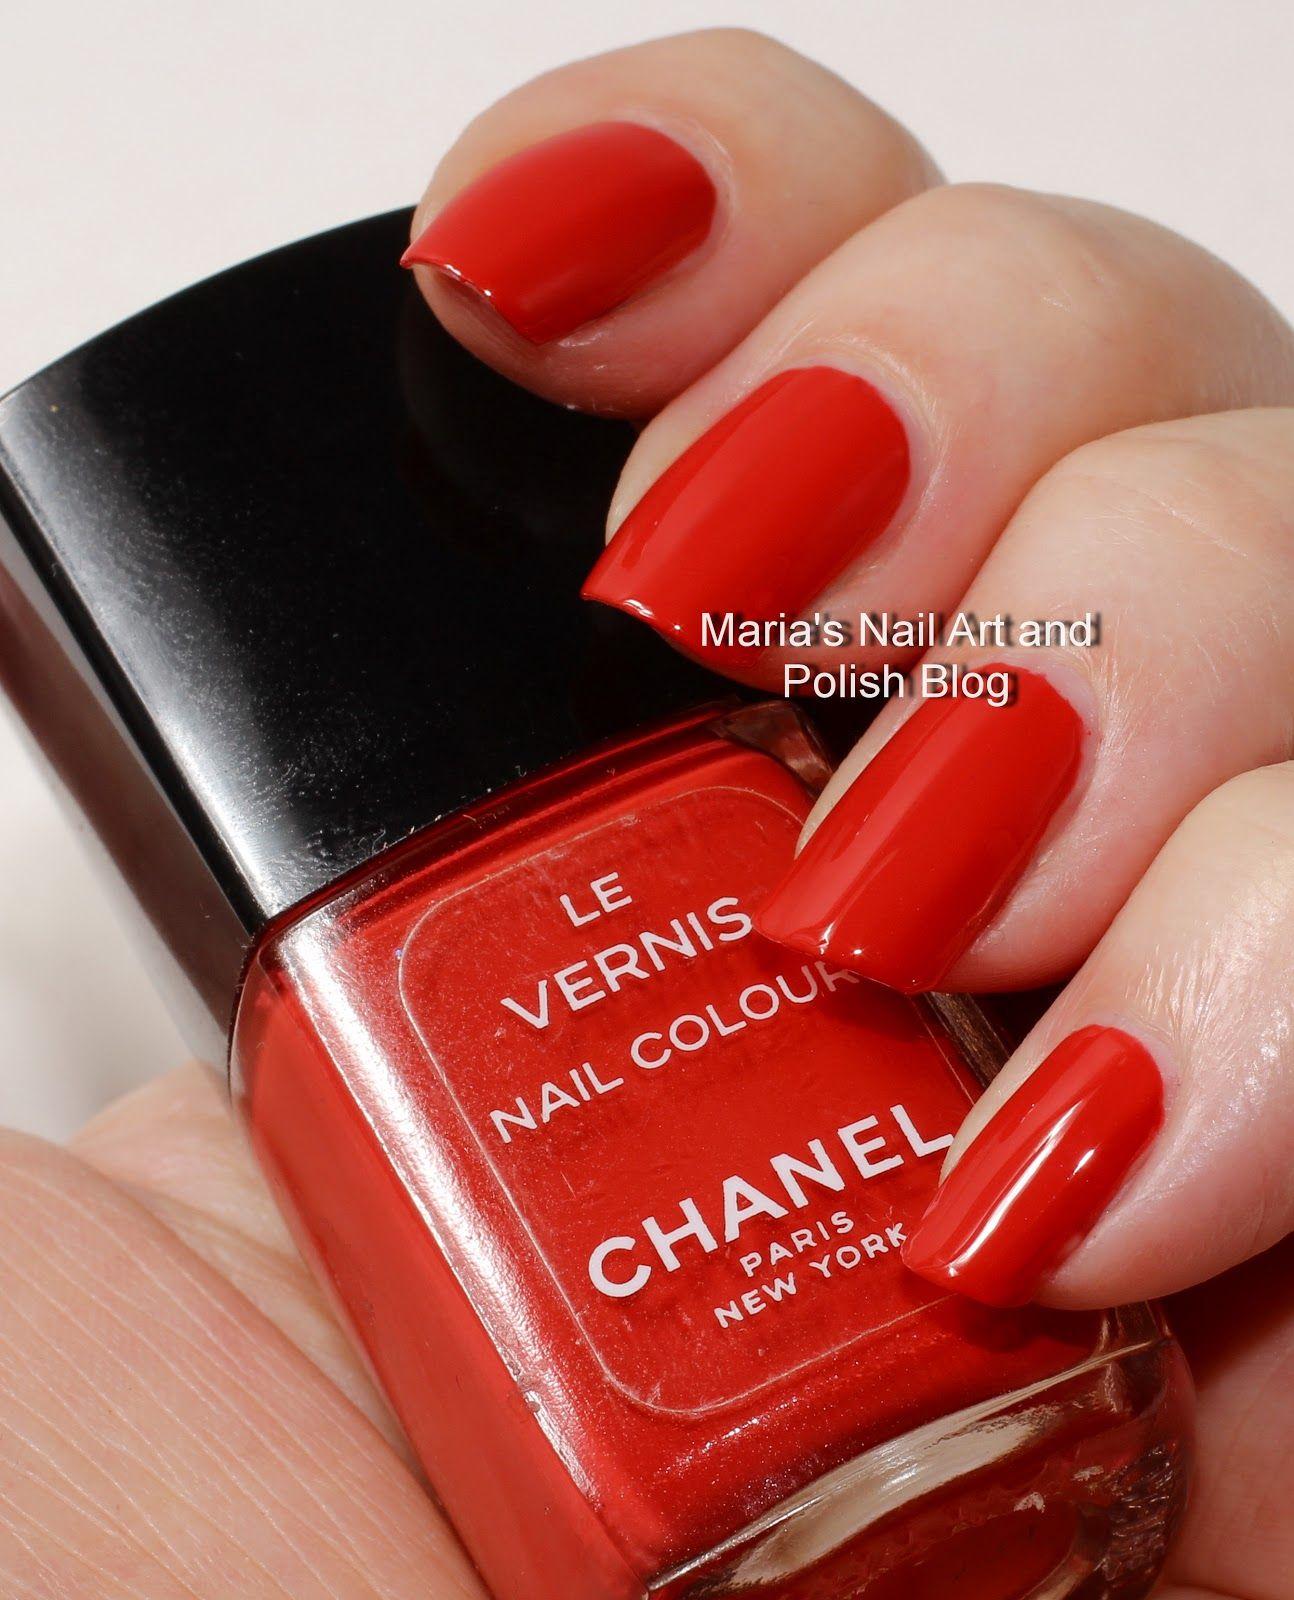 Chanel Le Vernis Longwear Nail Colours In Ballerina Organdi Monochrome Garconne Vamp And Rouge Noir New Formula Nail Colors Nail Polish Chanel Nail Polish